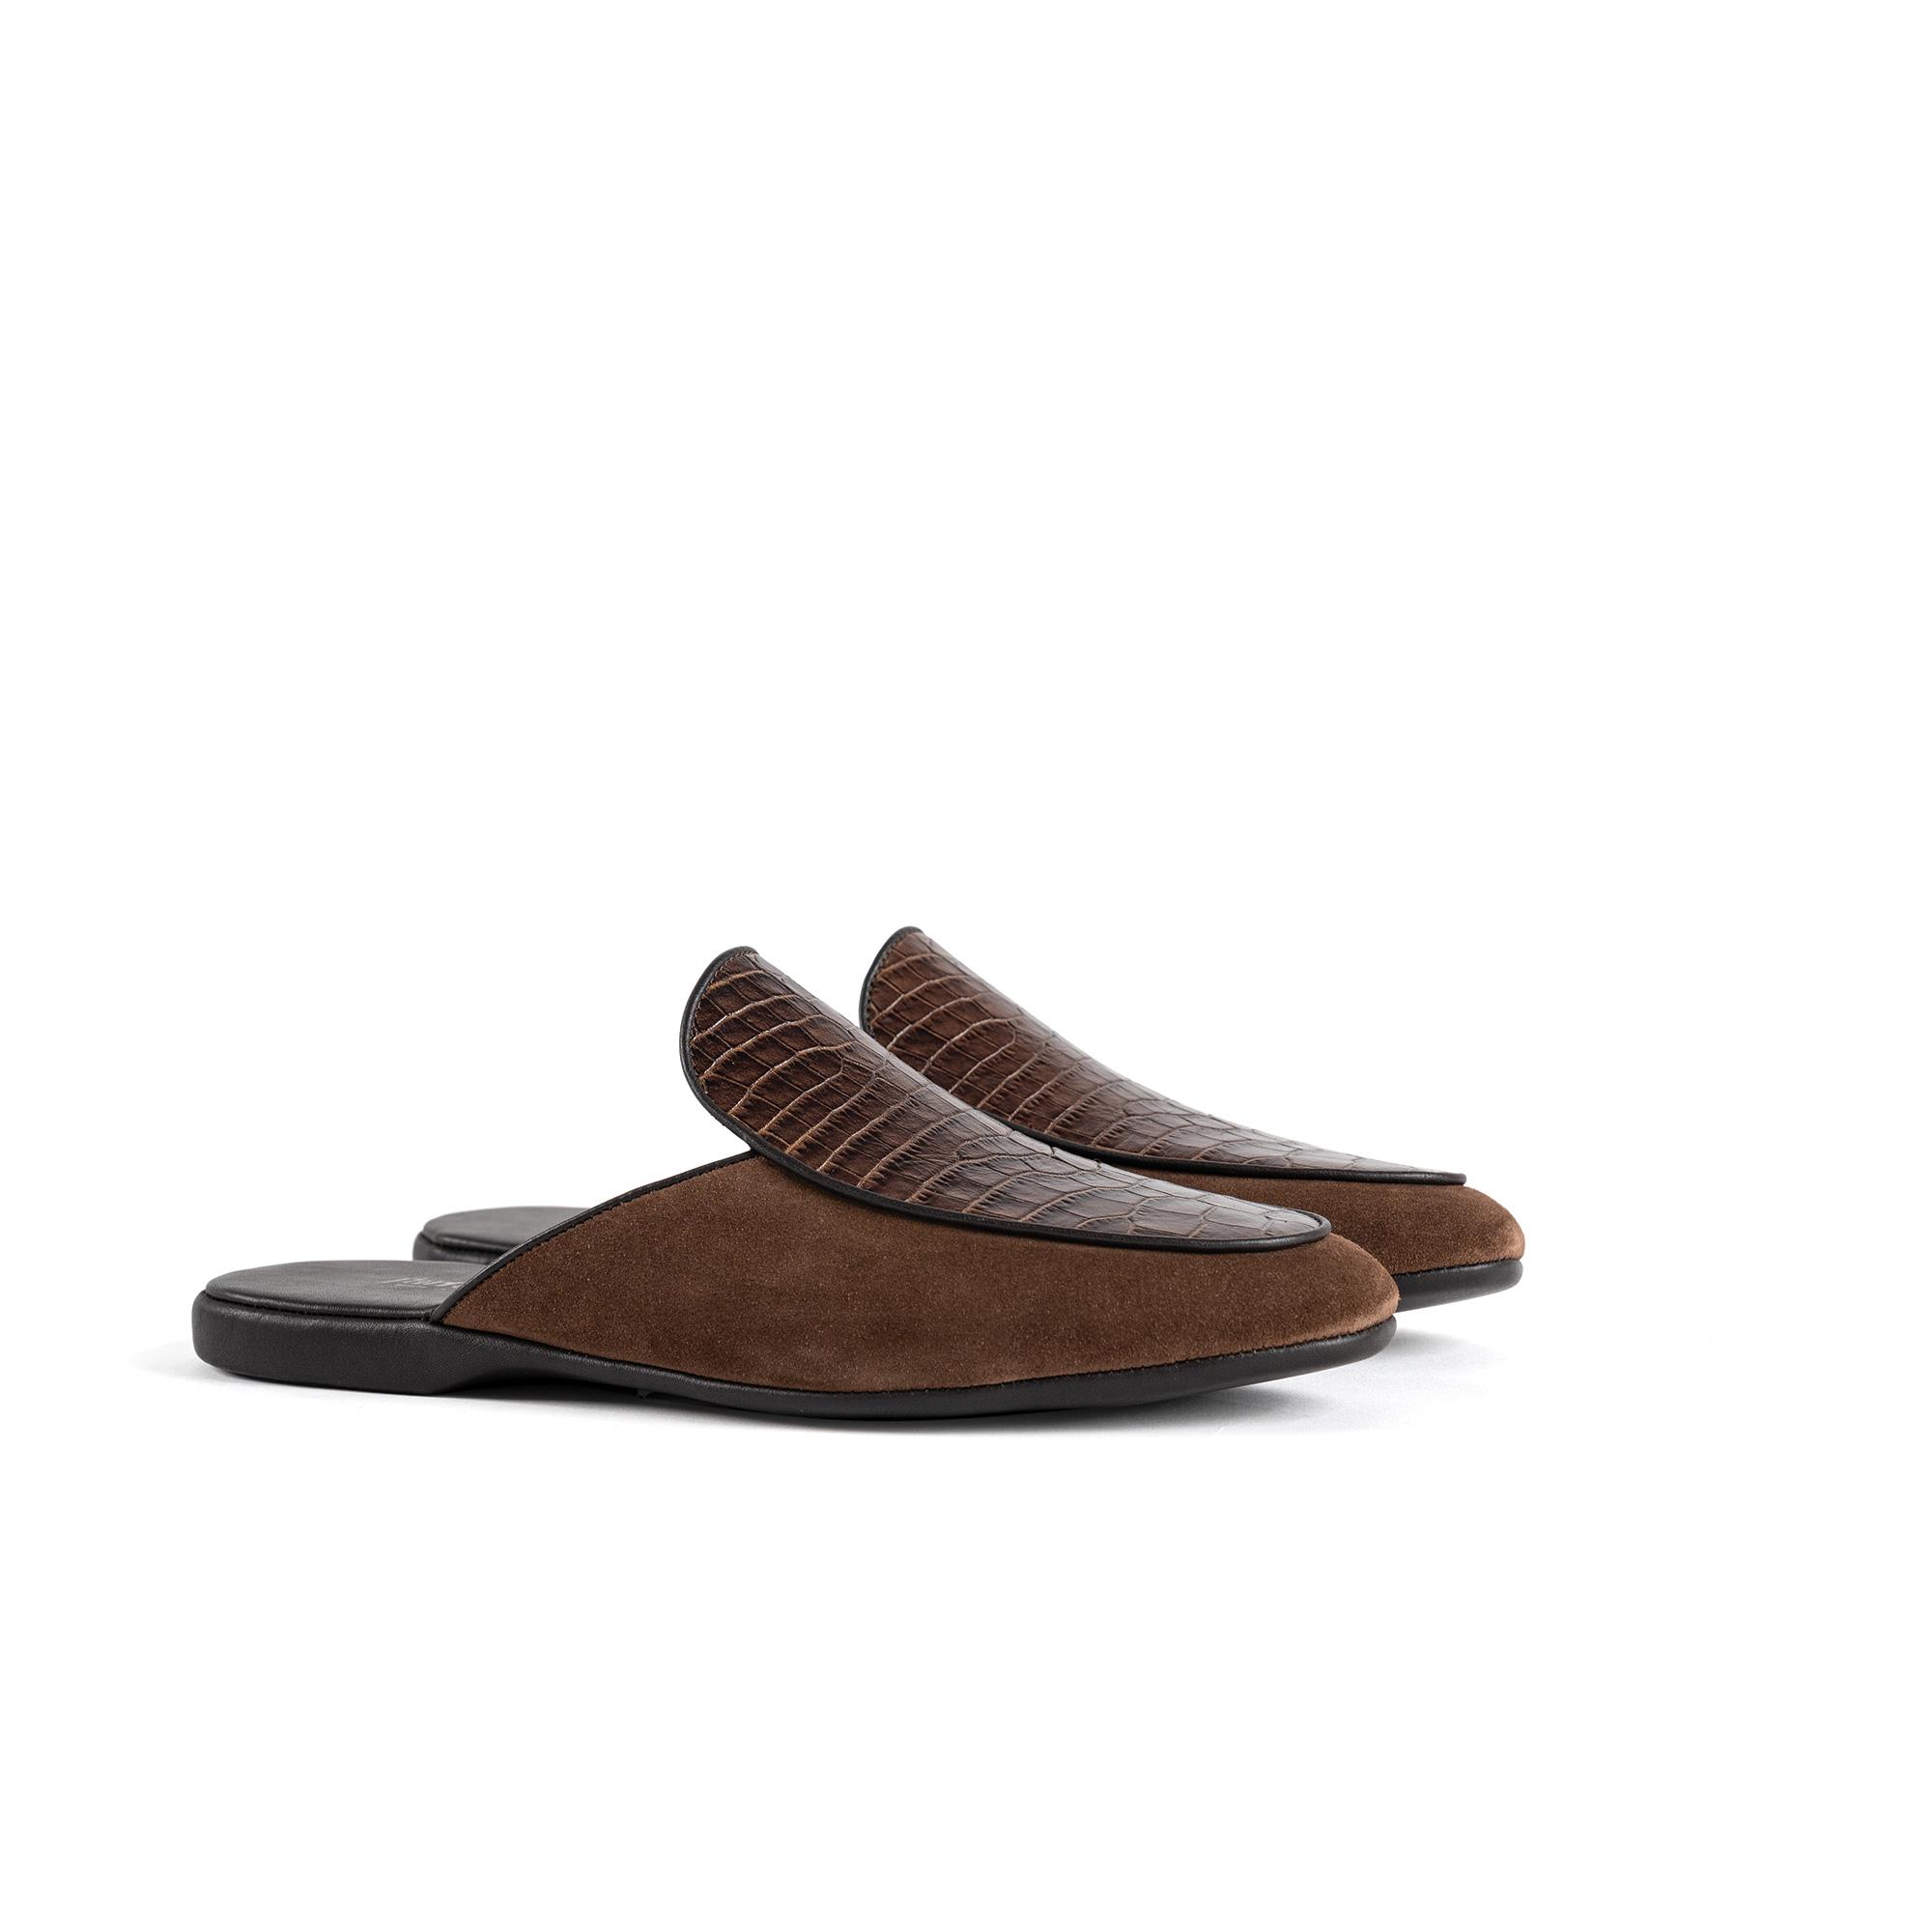 Indoor luxury slipper in brown velour - Farfalla italian slippers